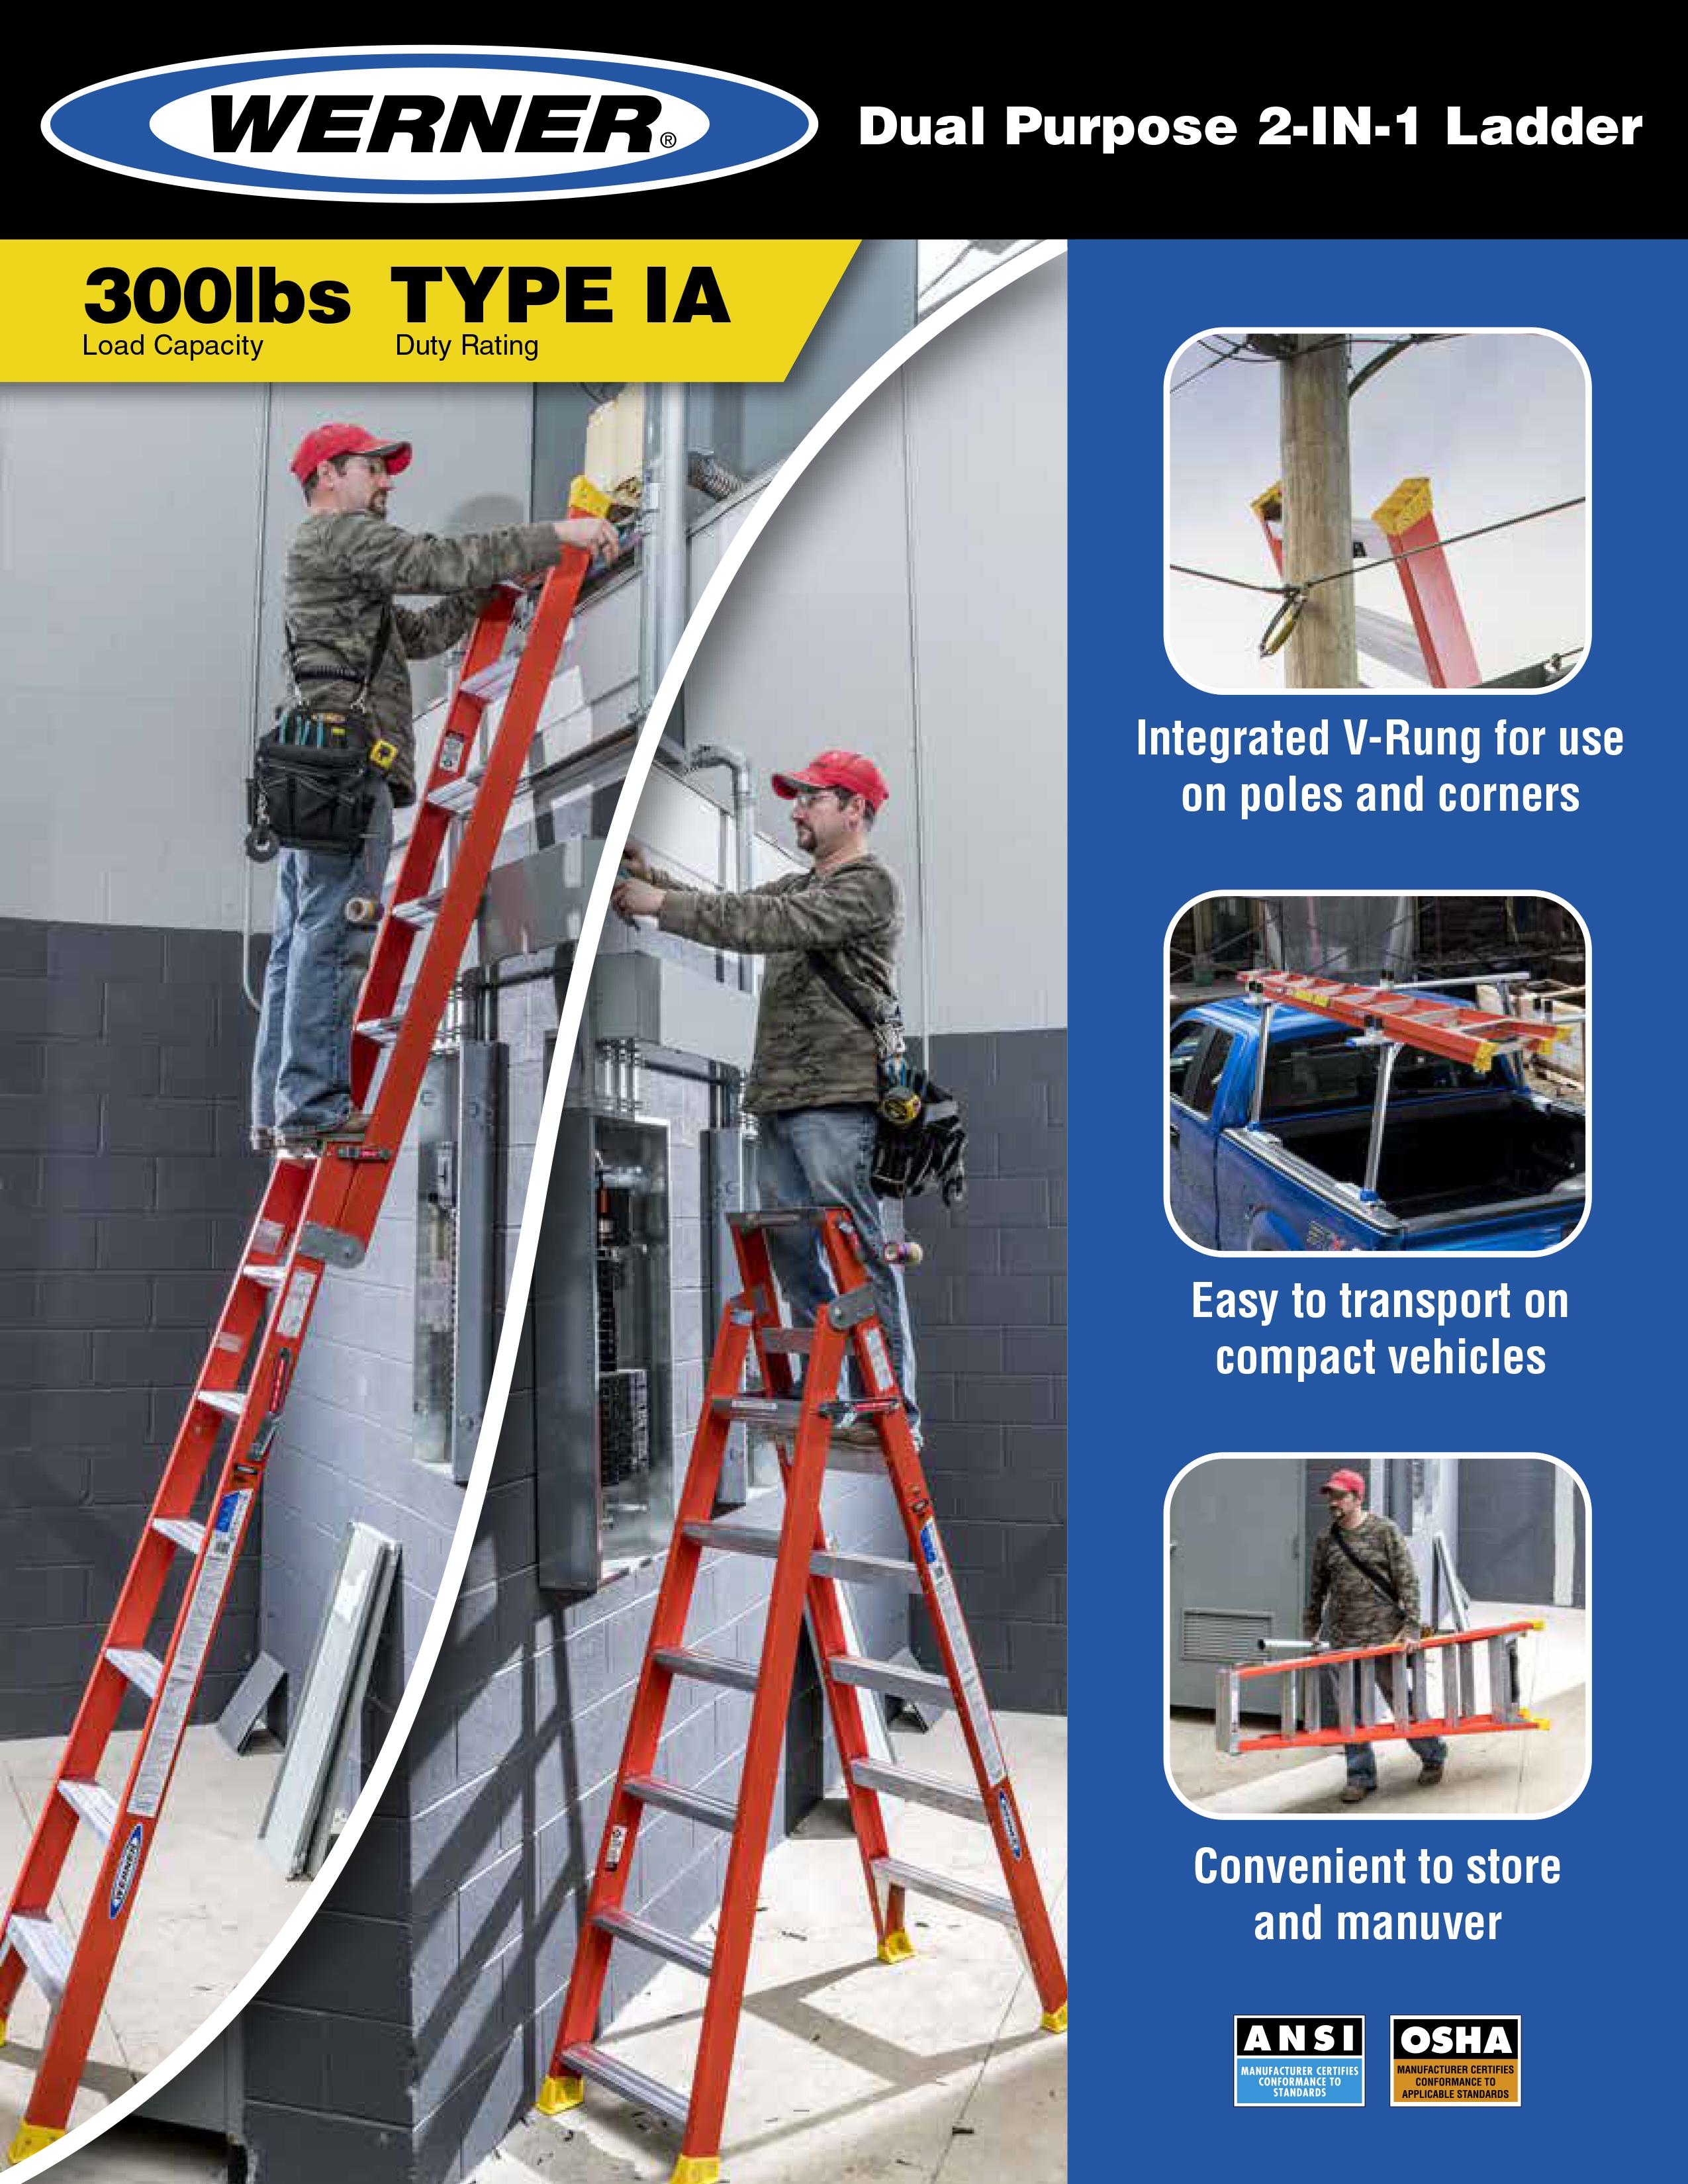 dp6200-dual-purpose-ladder-ss-1a.jpg